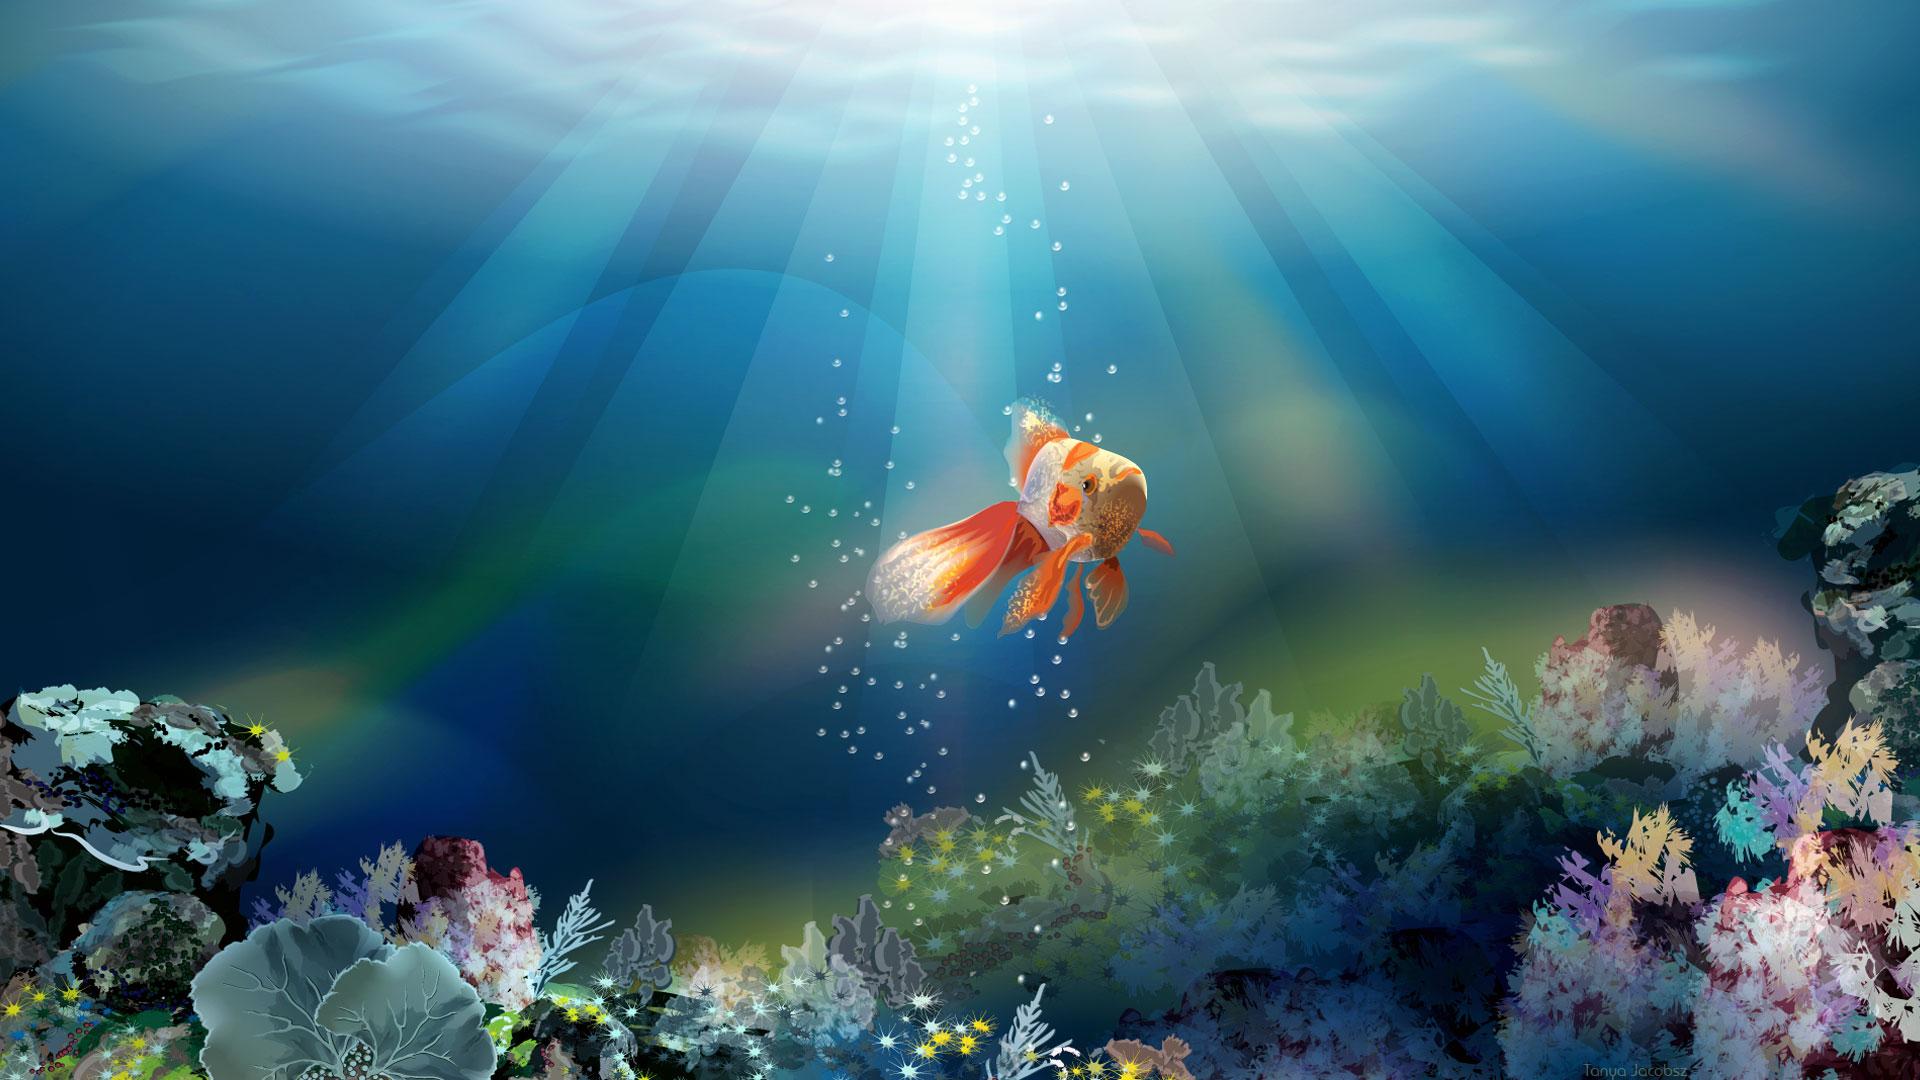 Cute Wallpapers Of All The Animals Fish Wallpaper 3d Desktop 10711 Wallpaper Walldiskpaper